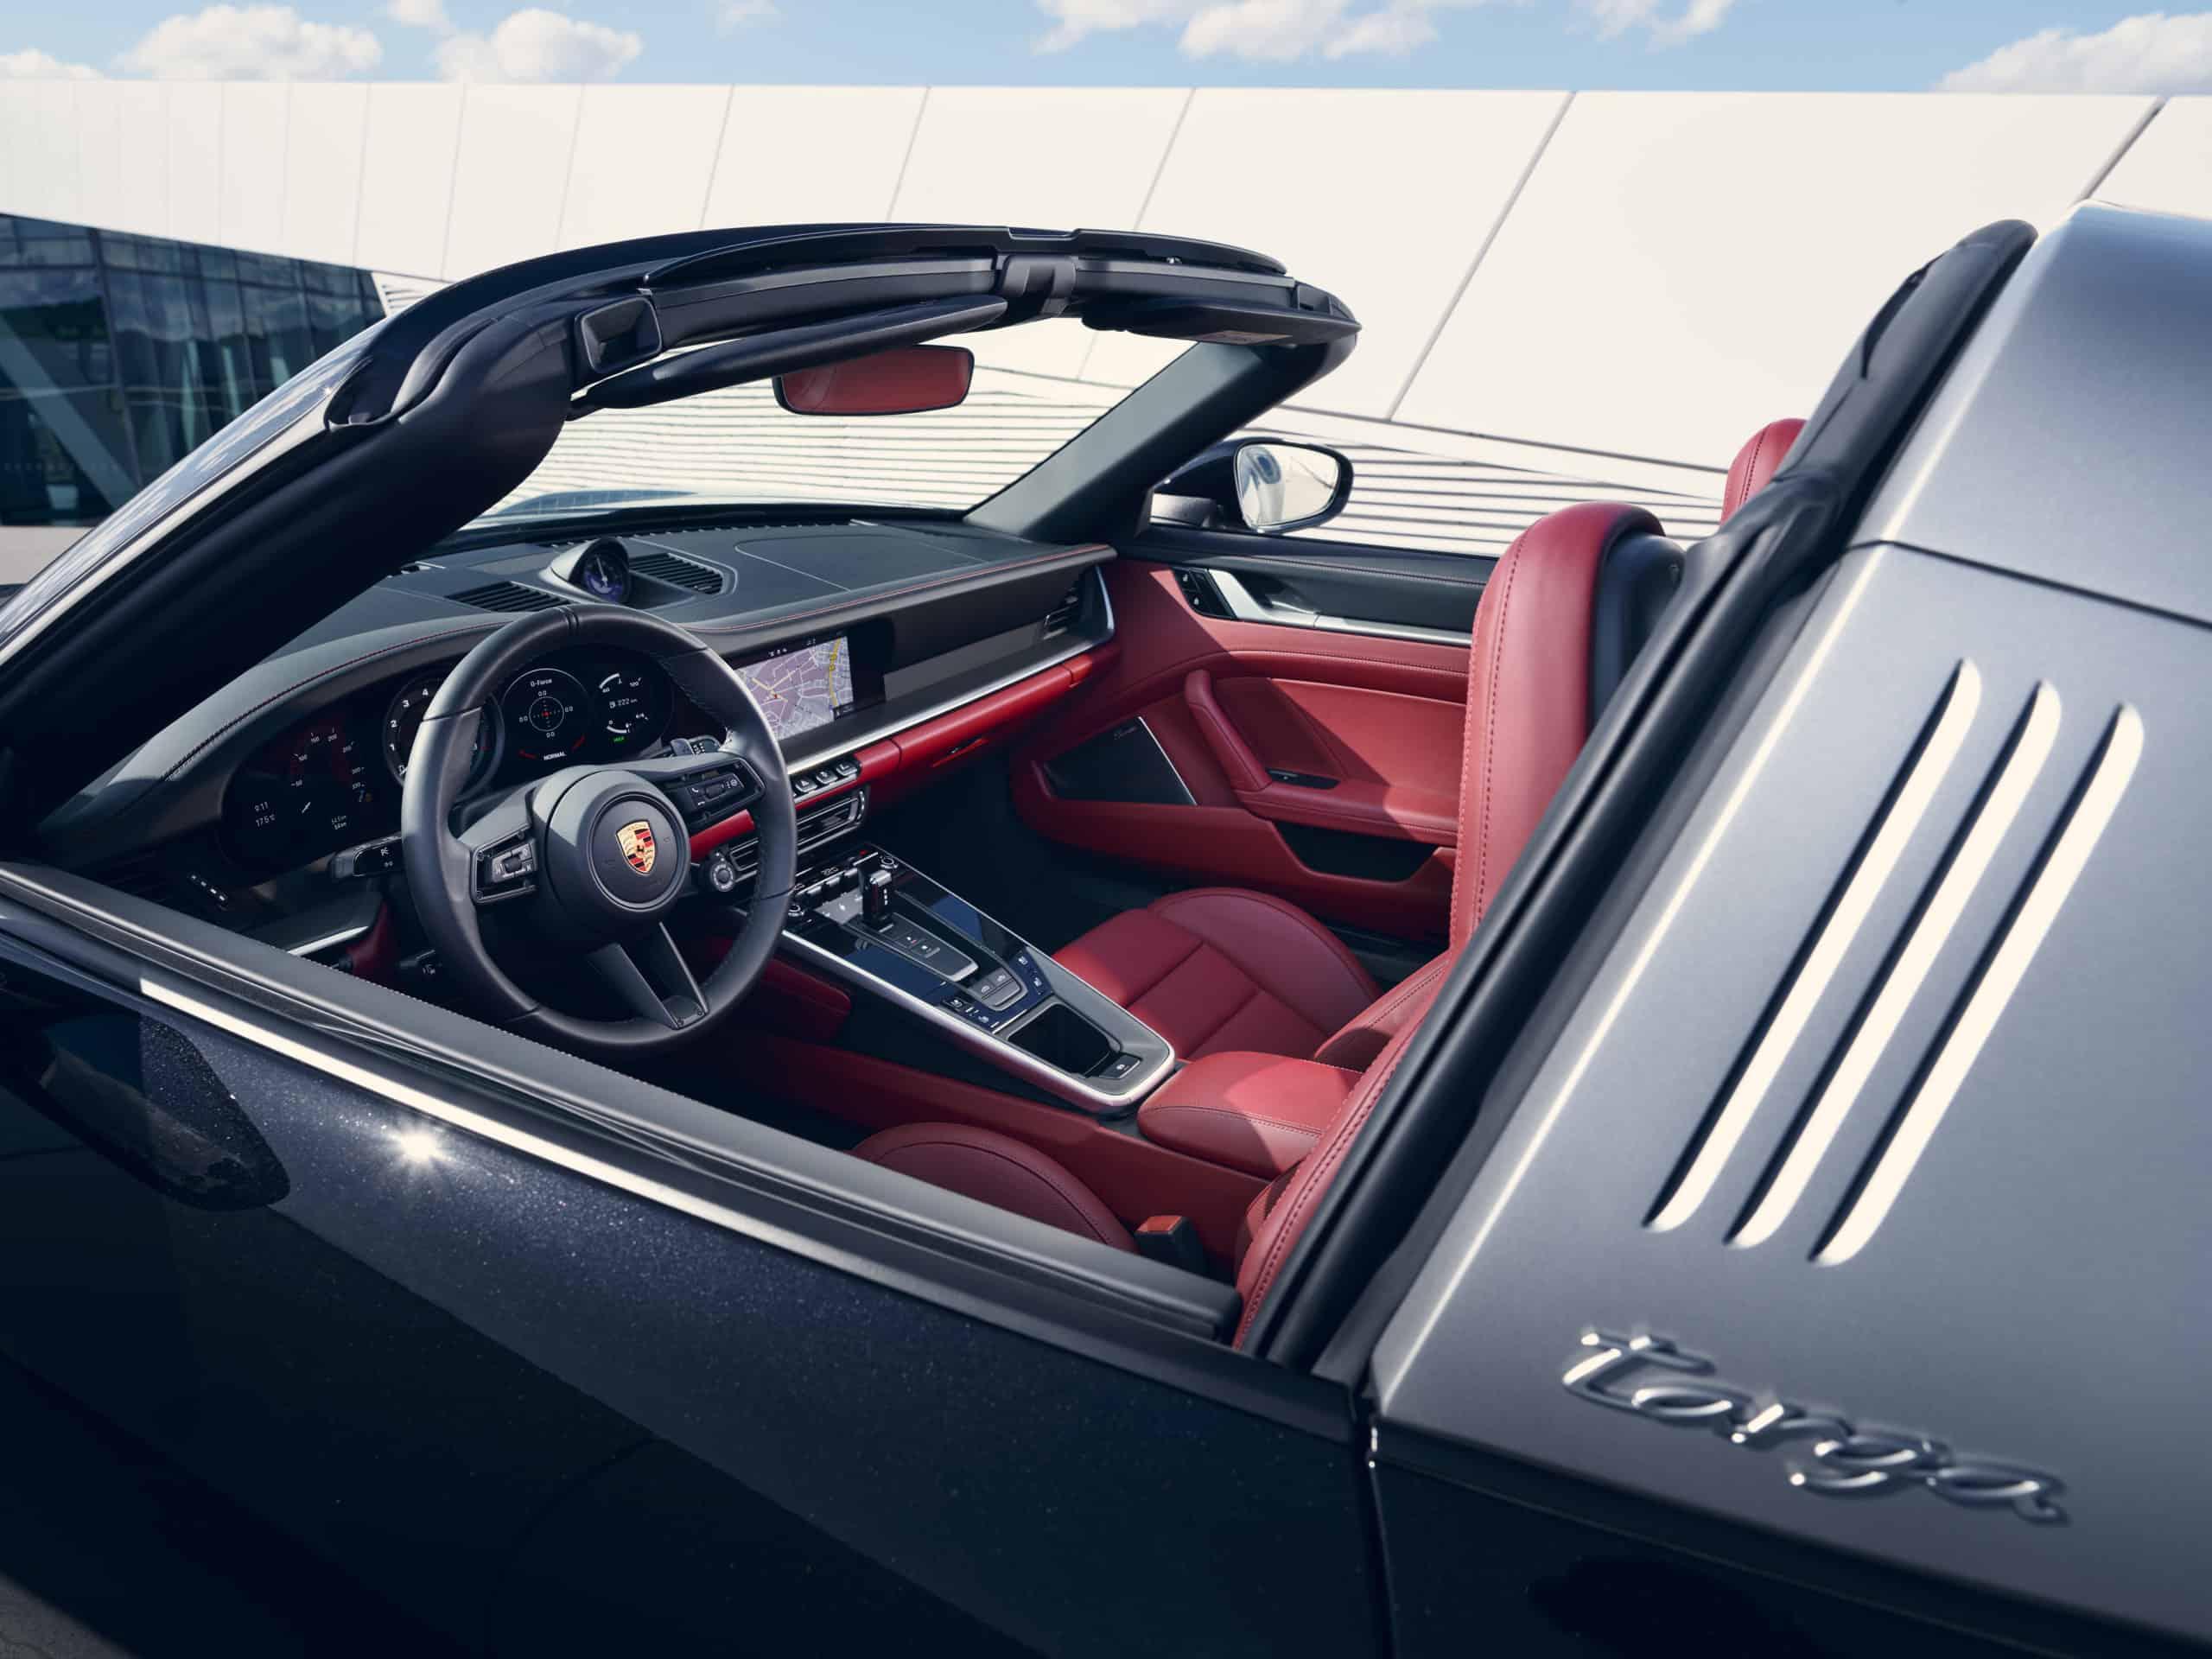 2021 Porsche 911 Targa 4S cockpit